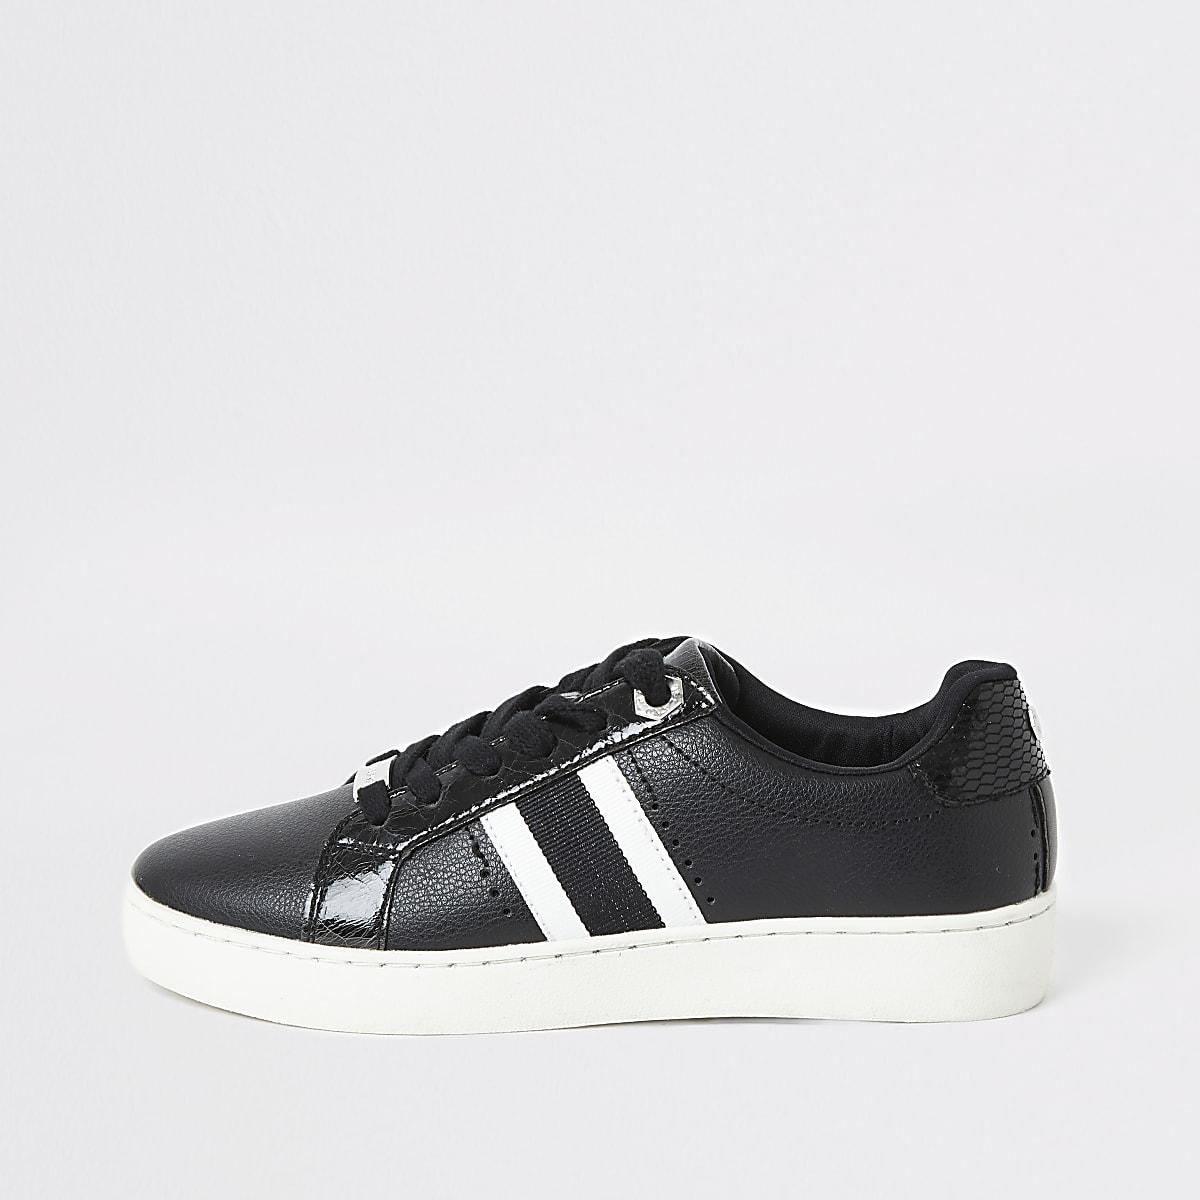 Zwarte gestreepte sneakers met veters